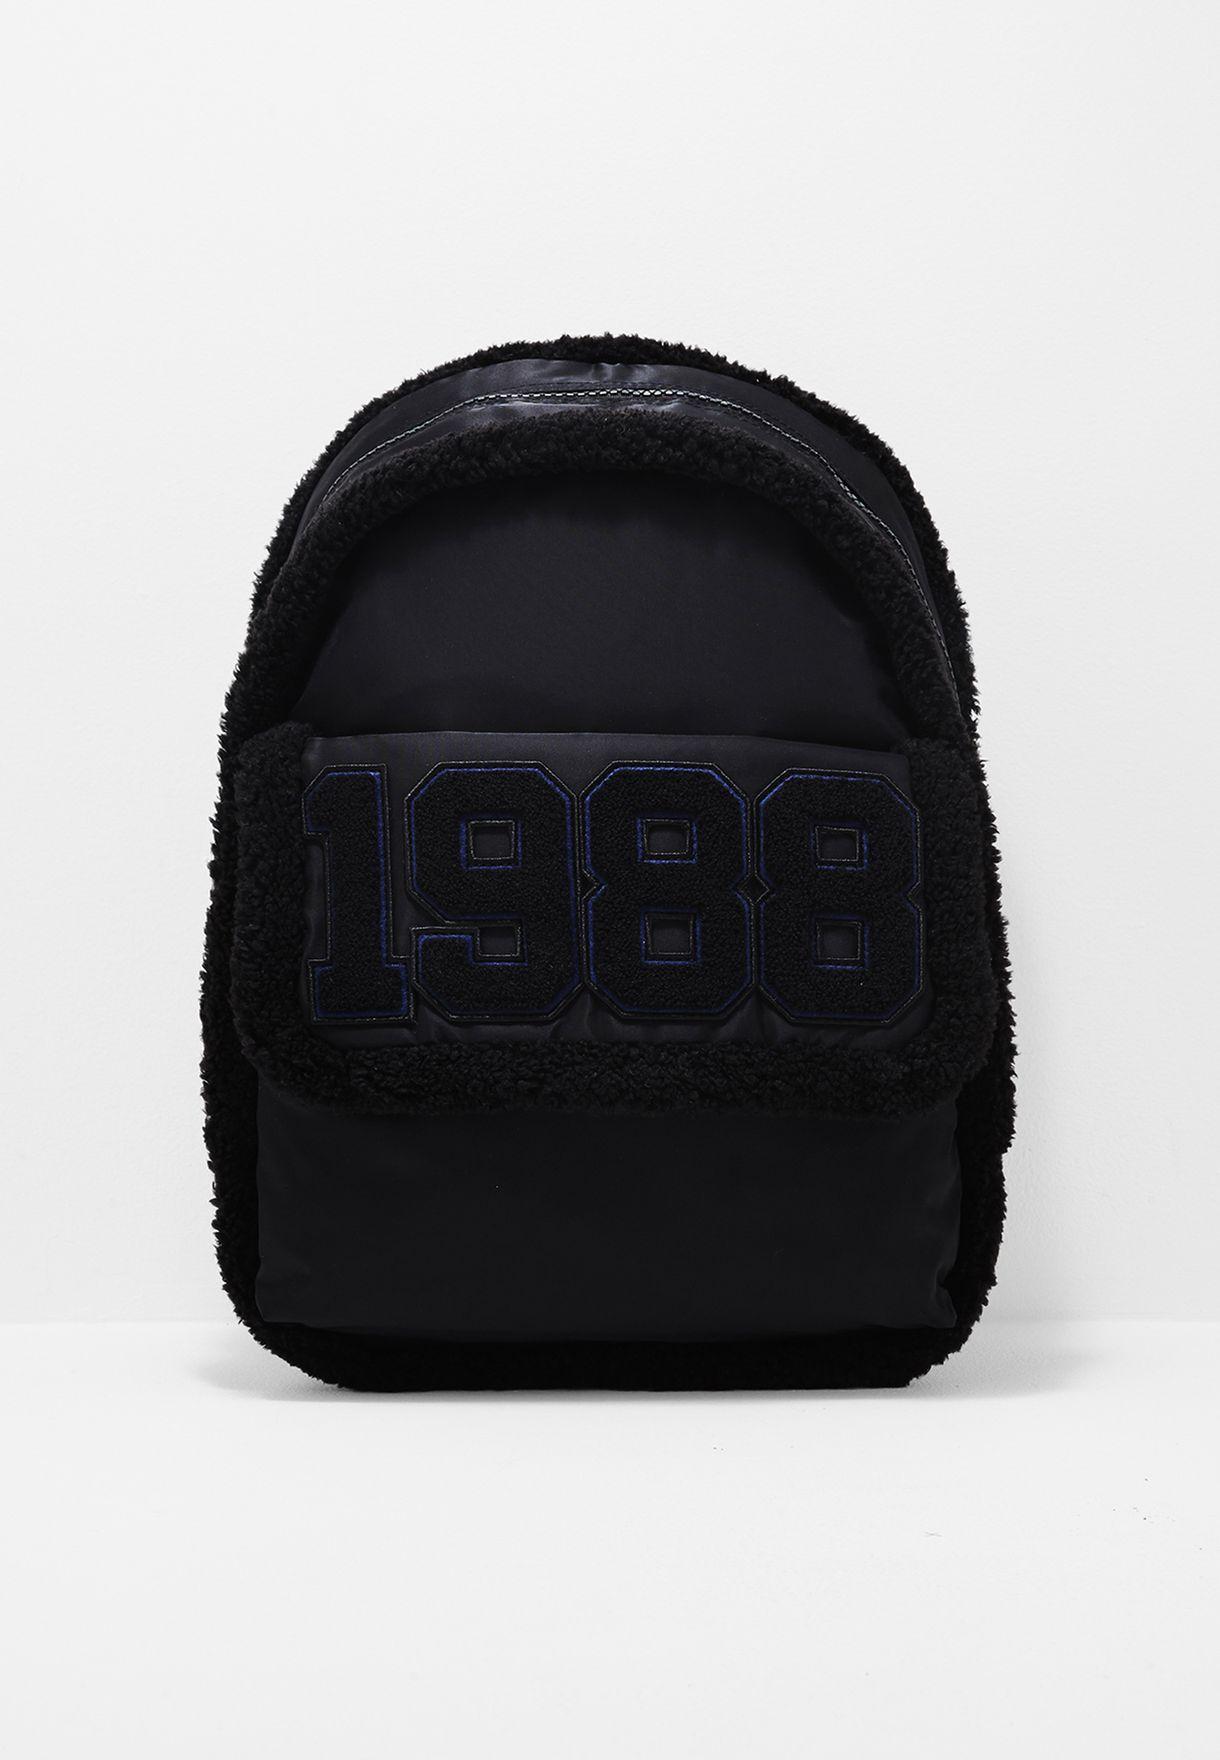 351fcf90c5 Shop PUMA x Fenty black Sherpa Backpack 7533501 for Women in UAE ...